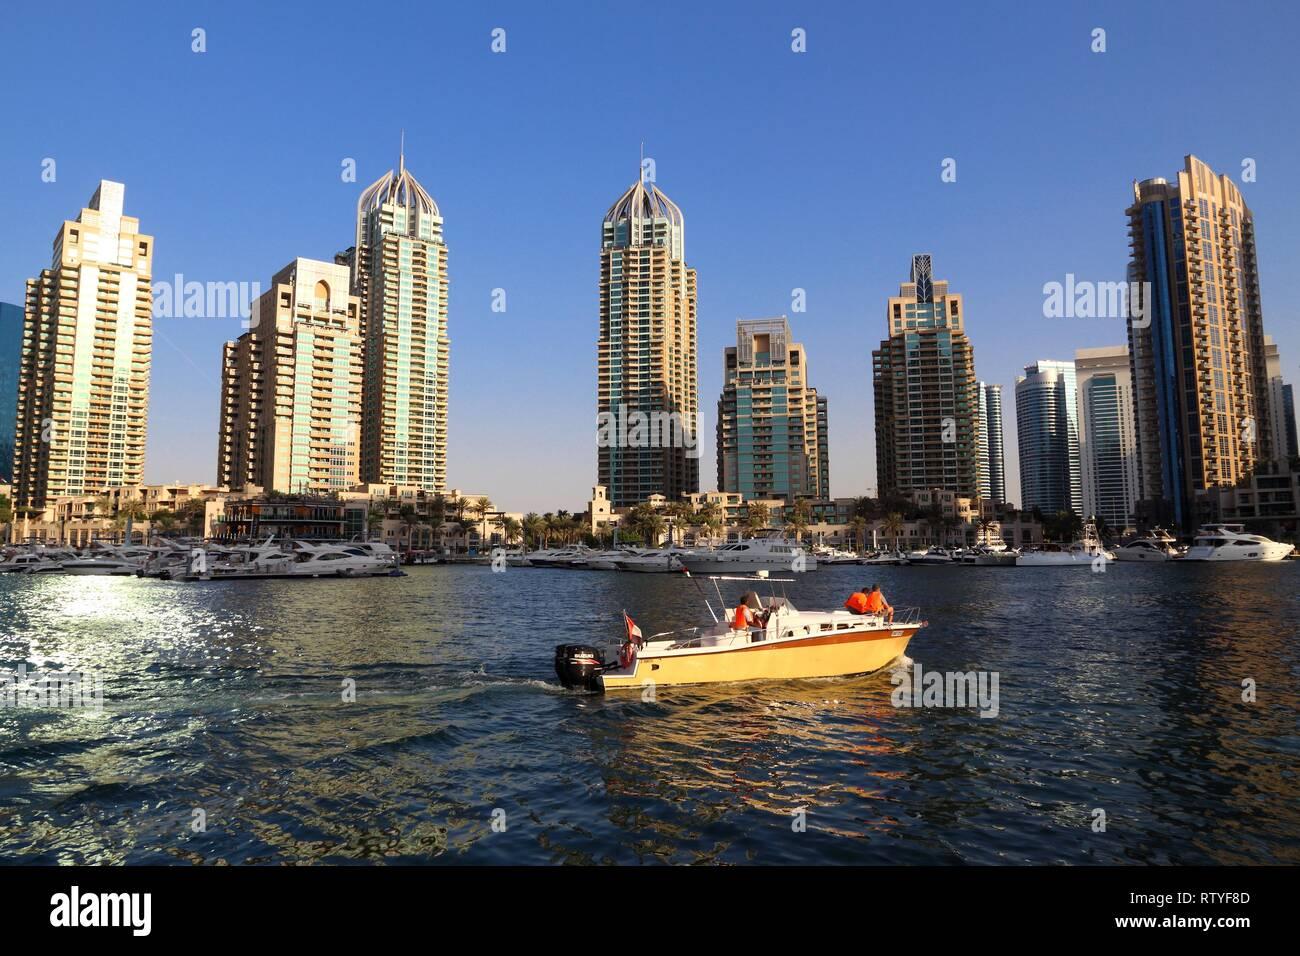 DUBAI, UAE - NOVEMBER 23, 2017: Boating in Dubai Marina district, United Arab Emirates. Dubai is the most populous city in UAE and a major global city - Stock Image